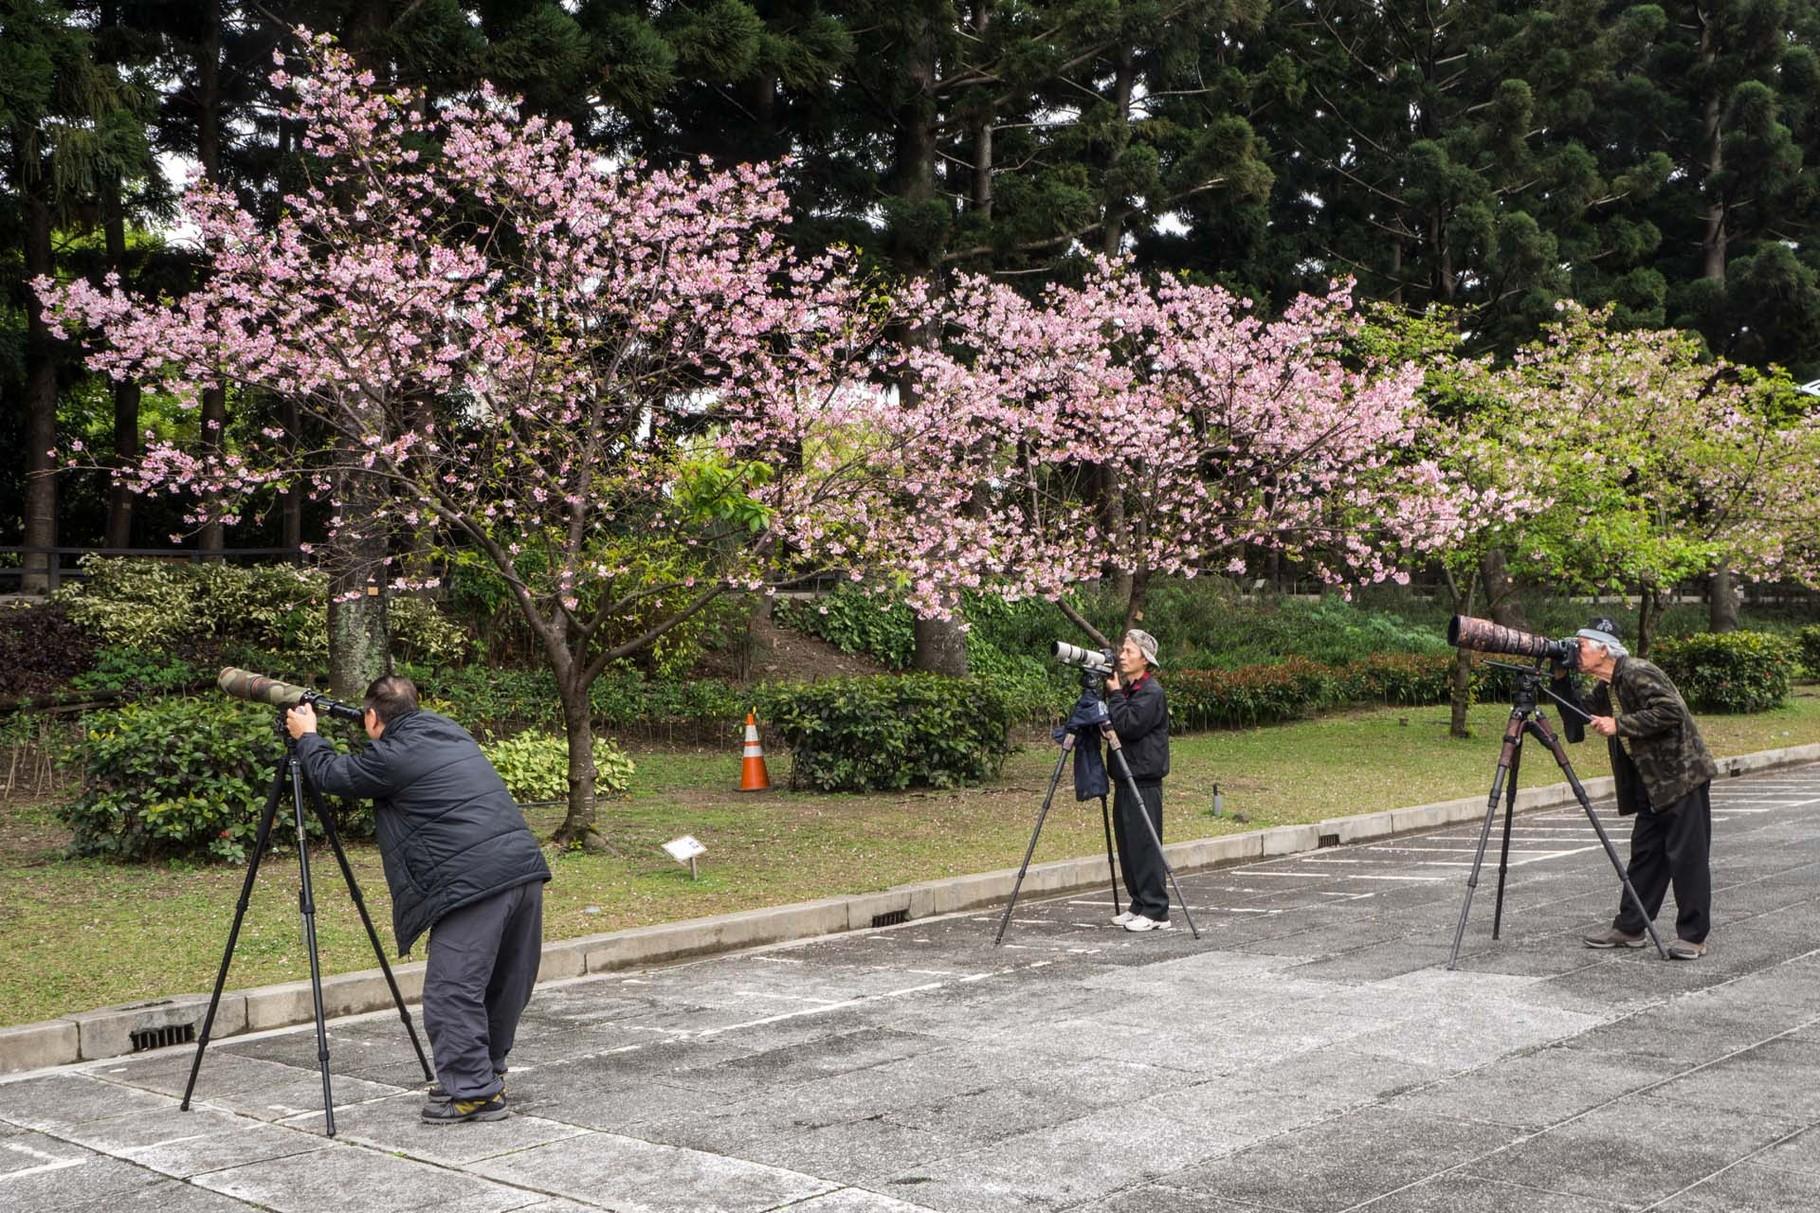 Cherry blossom photographers ;-)